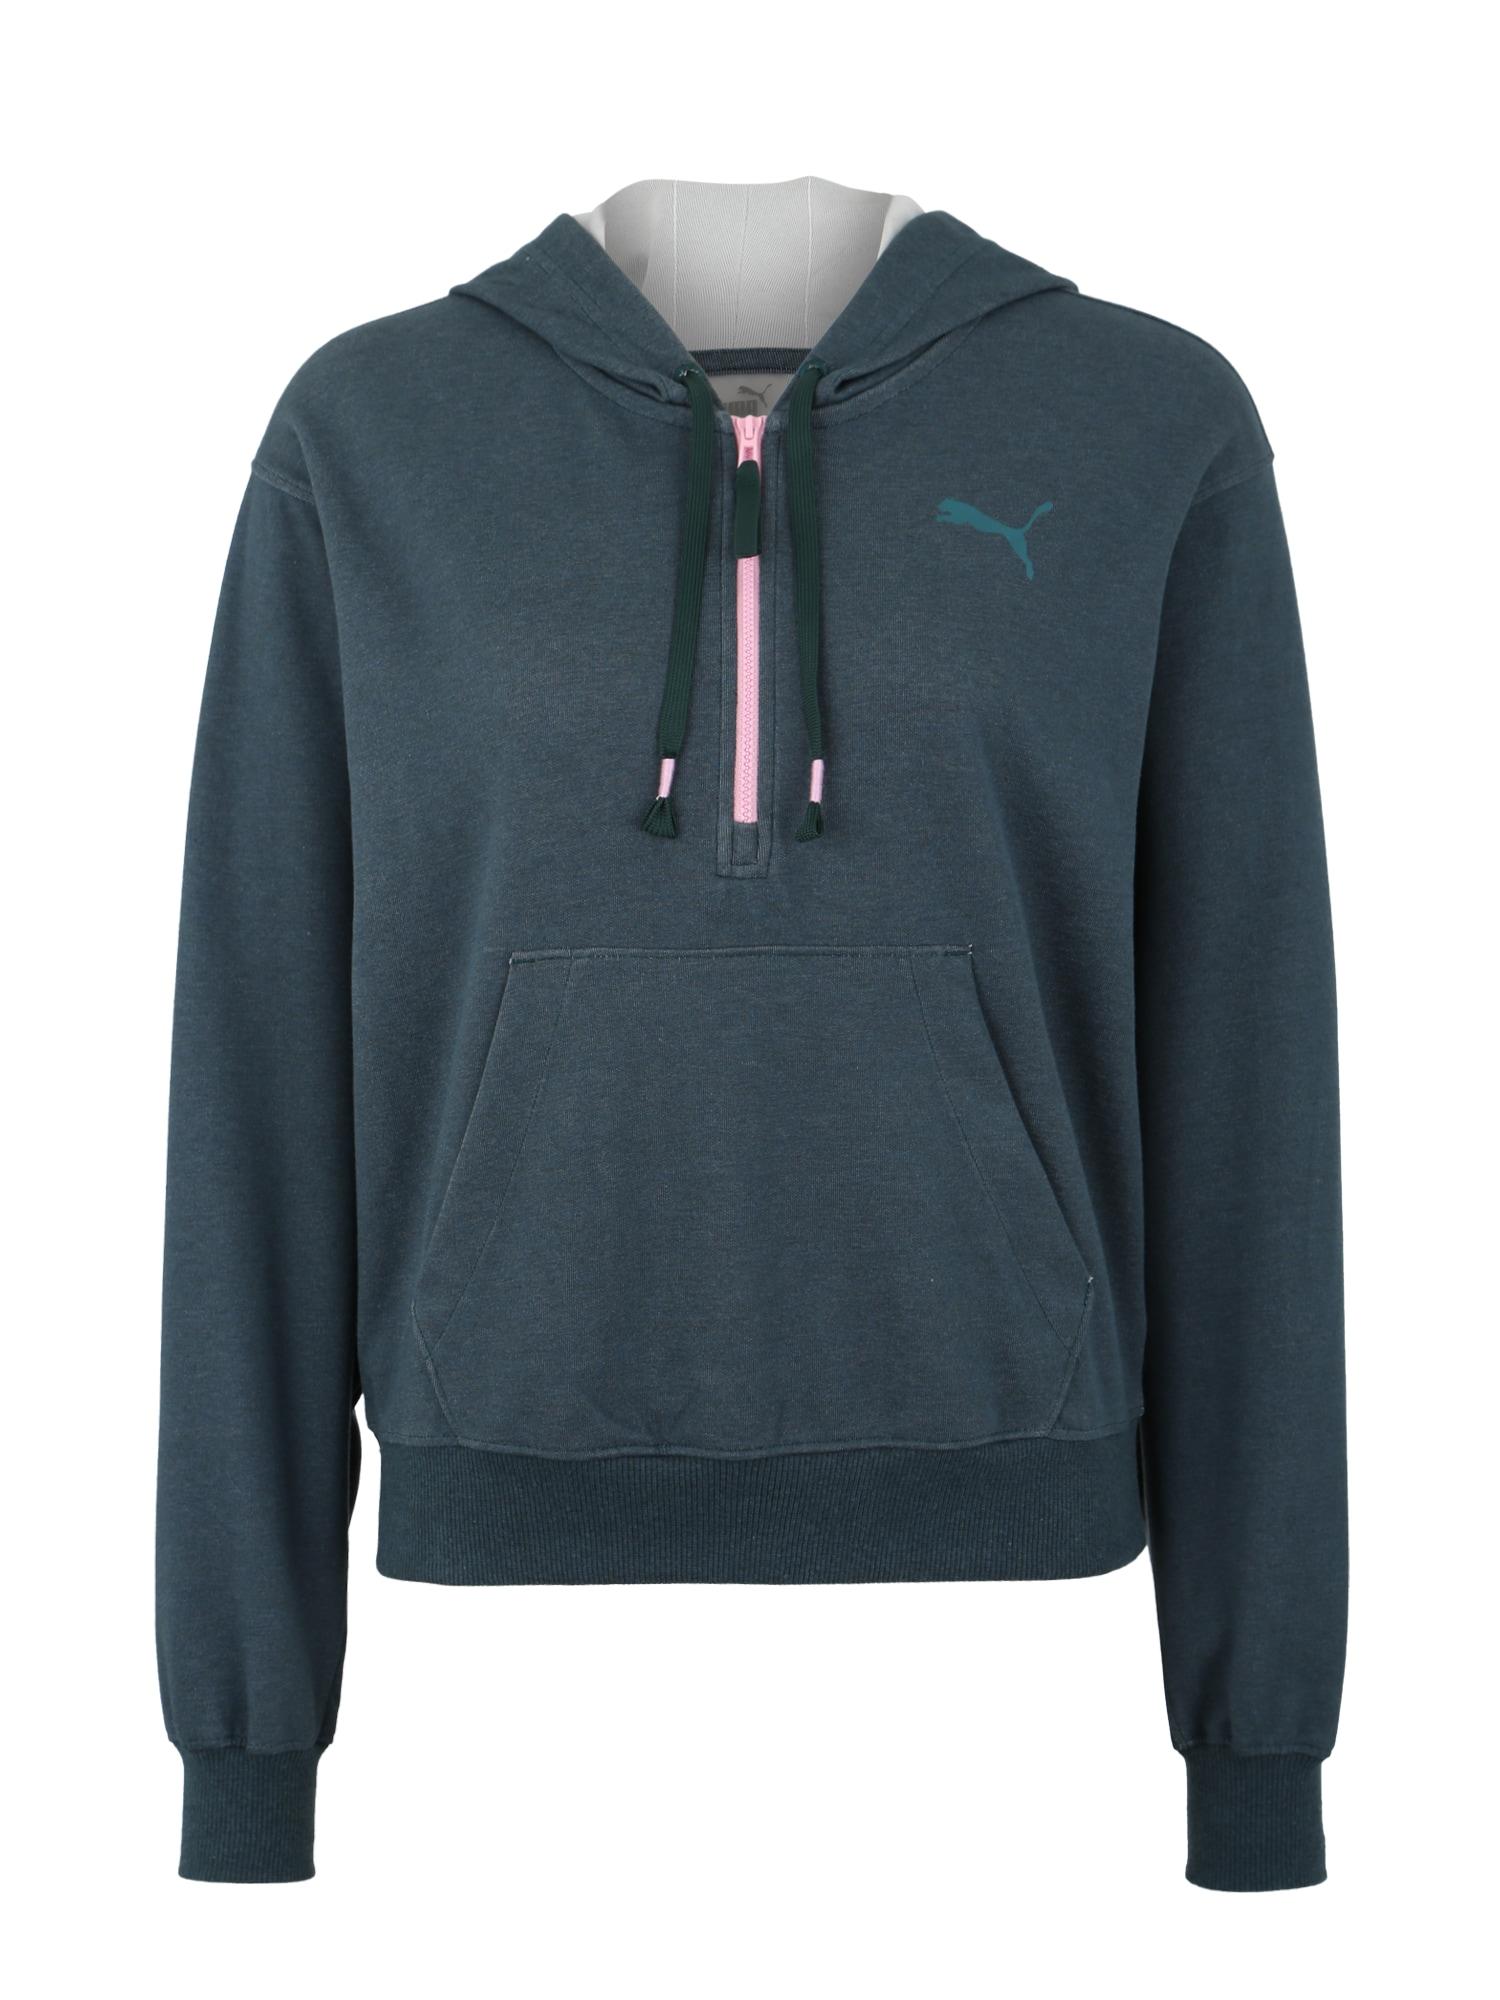 Sweatshirt 'Feel It Cover up'   Bekleidung > Sweatshirts & -jacken > Sweatshirts   Puma